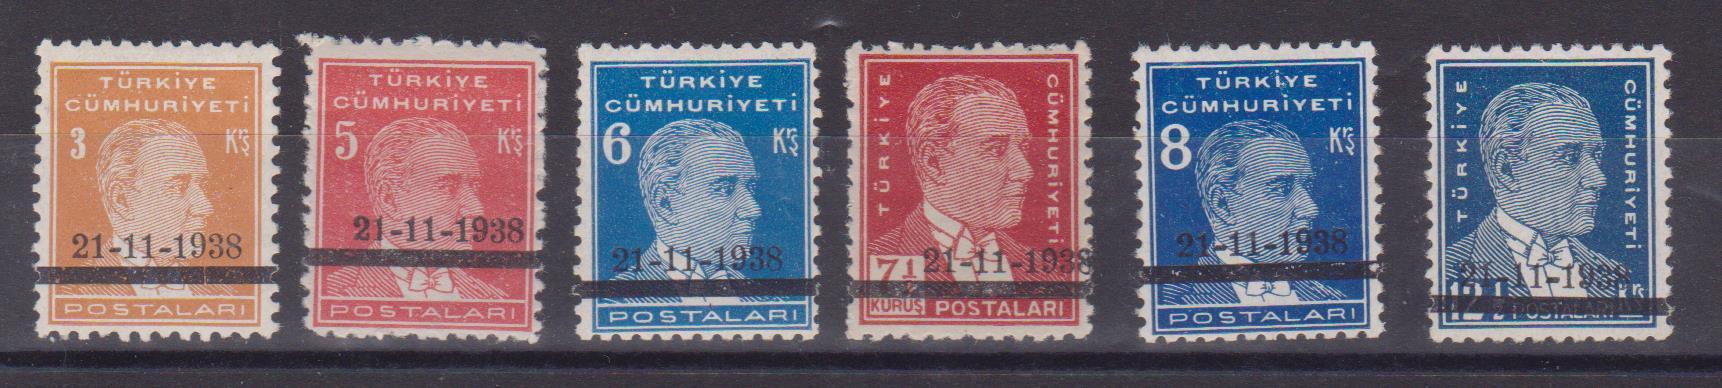 turchia 917a-17f 001